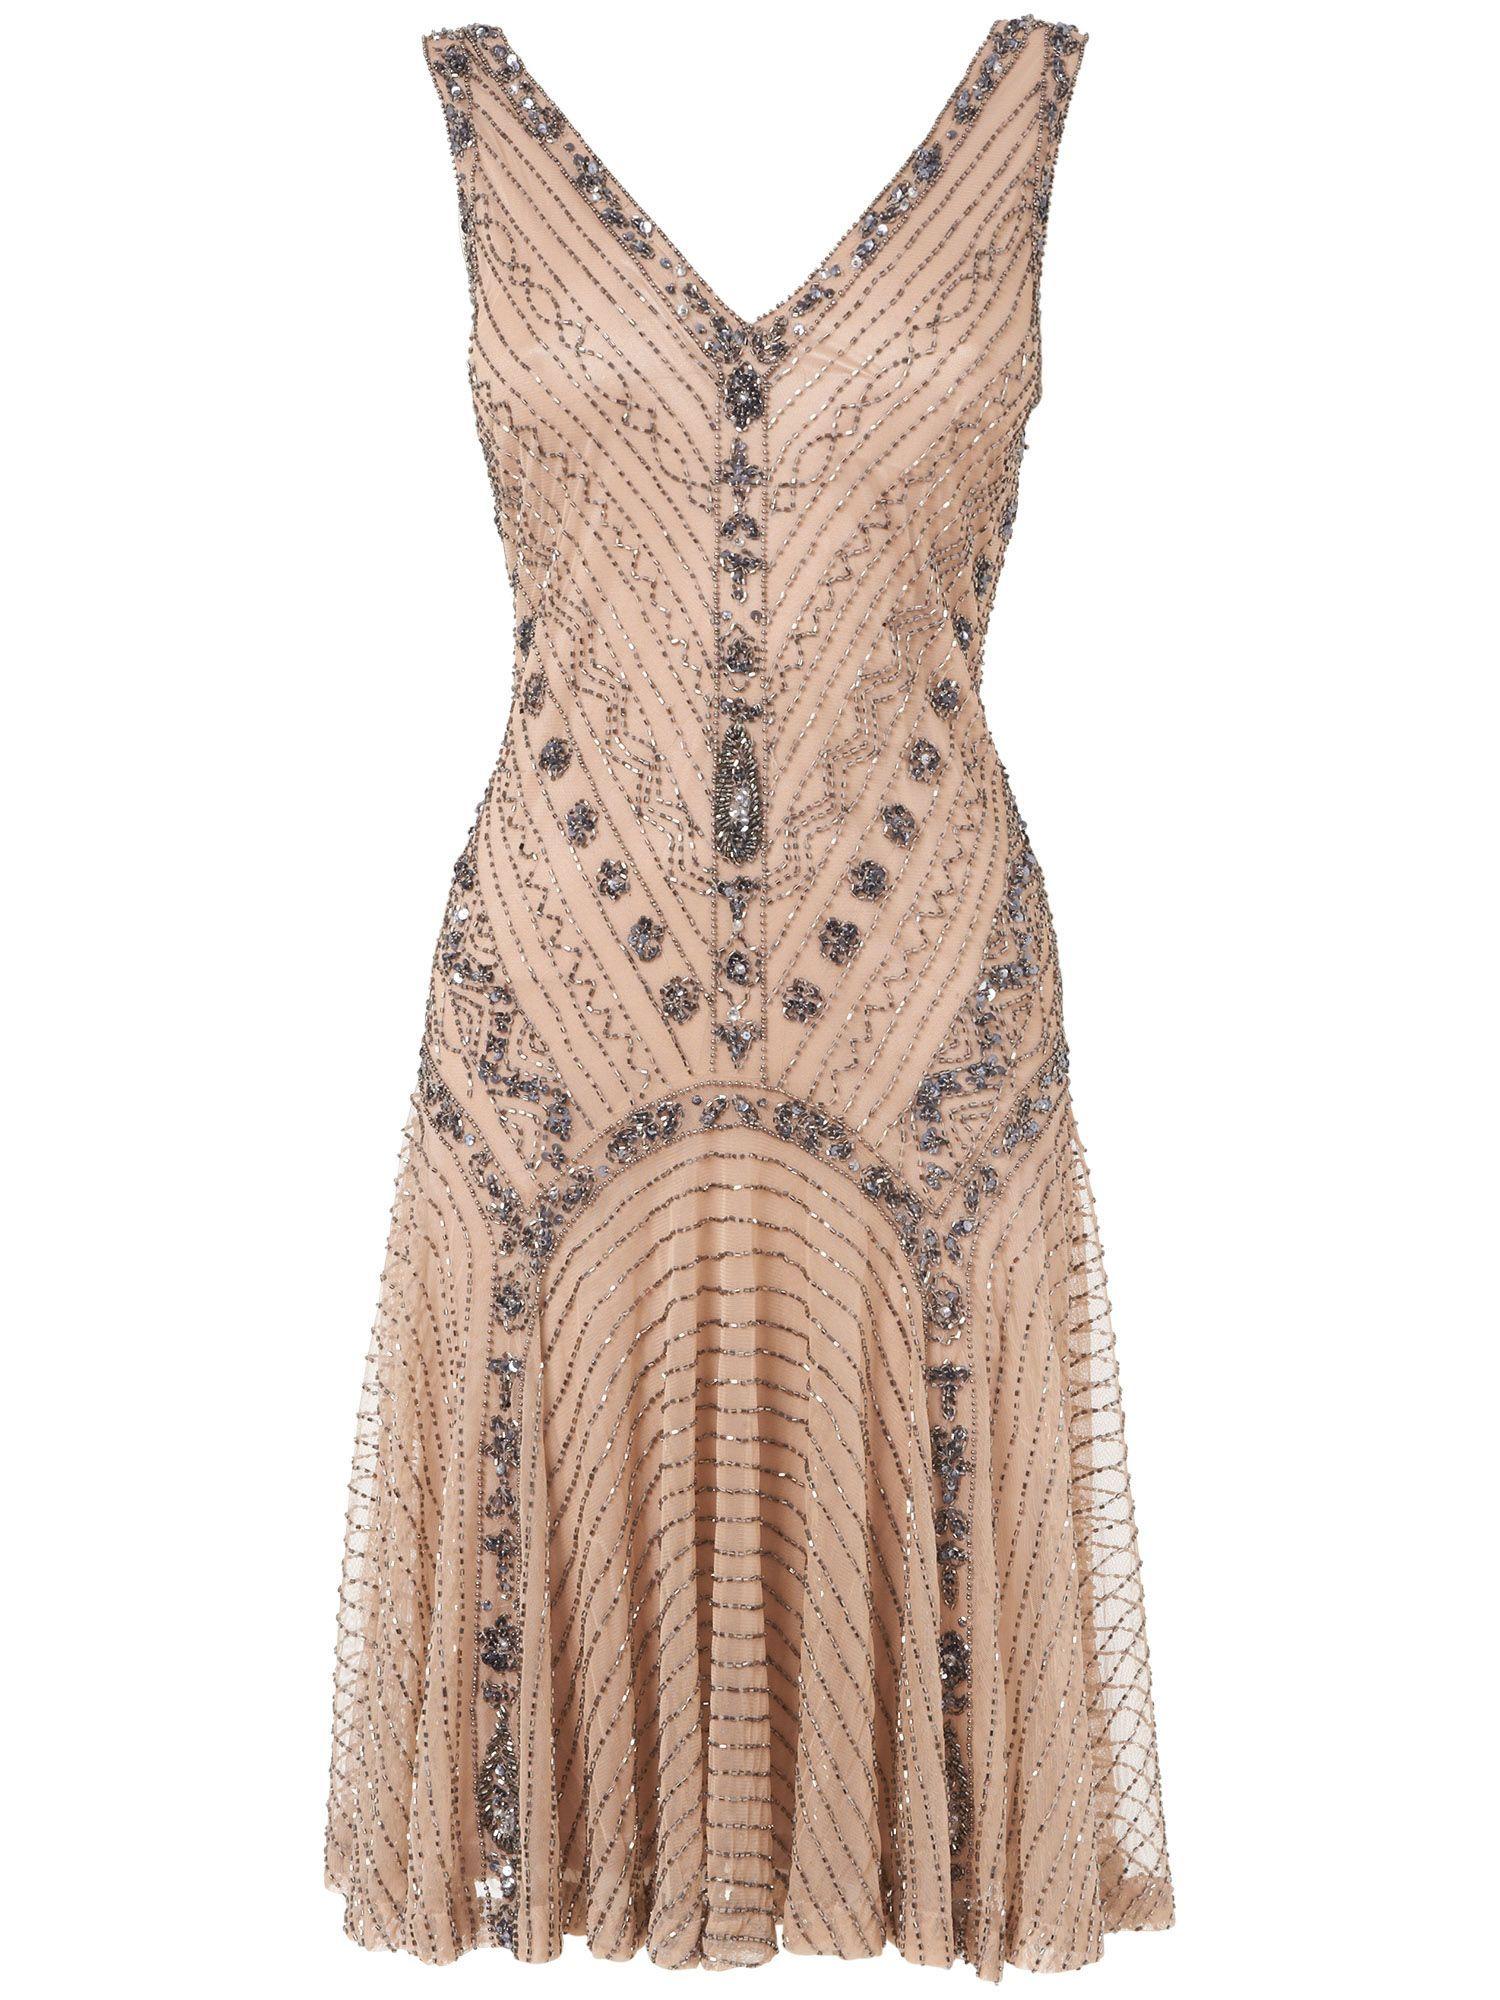 S dresses uk s pinterest flapper dress uk s